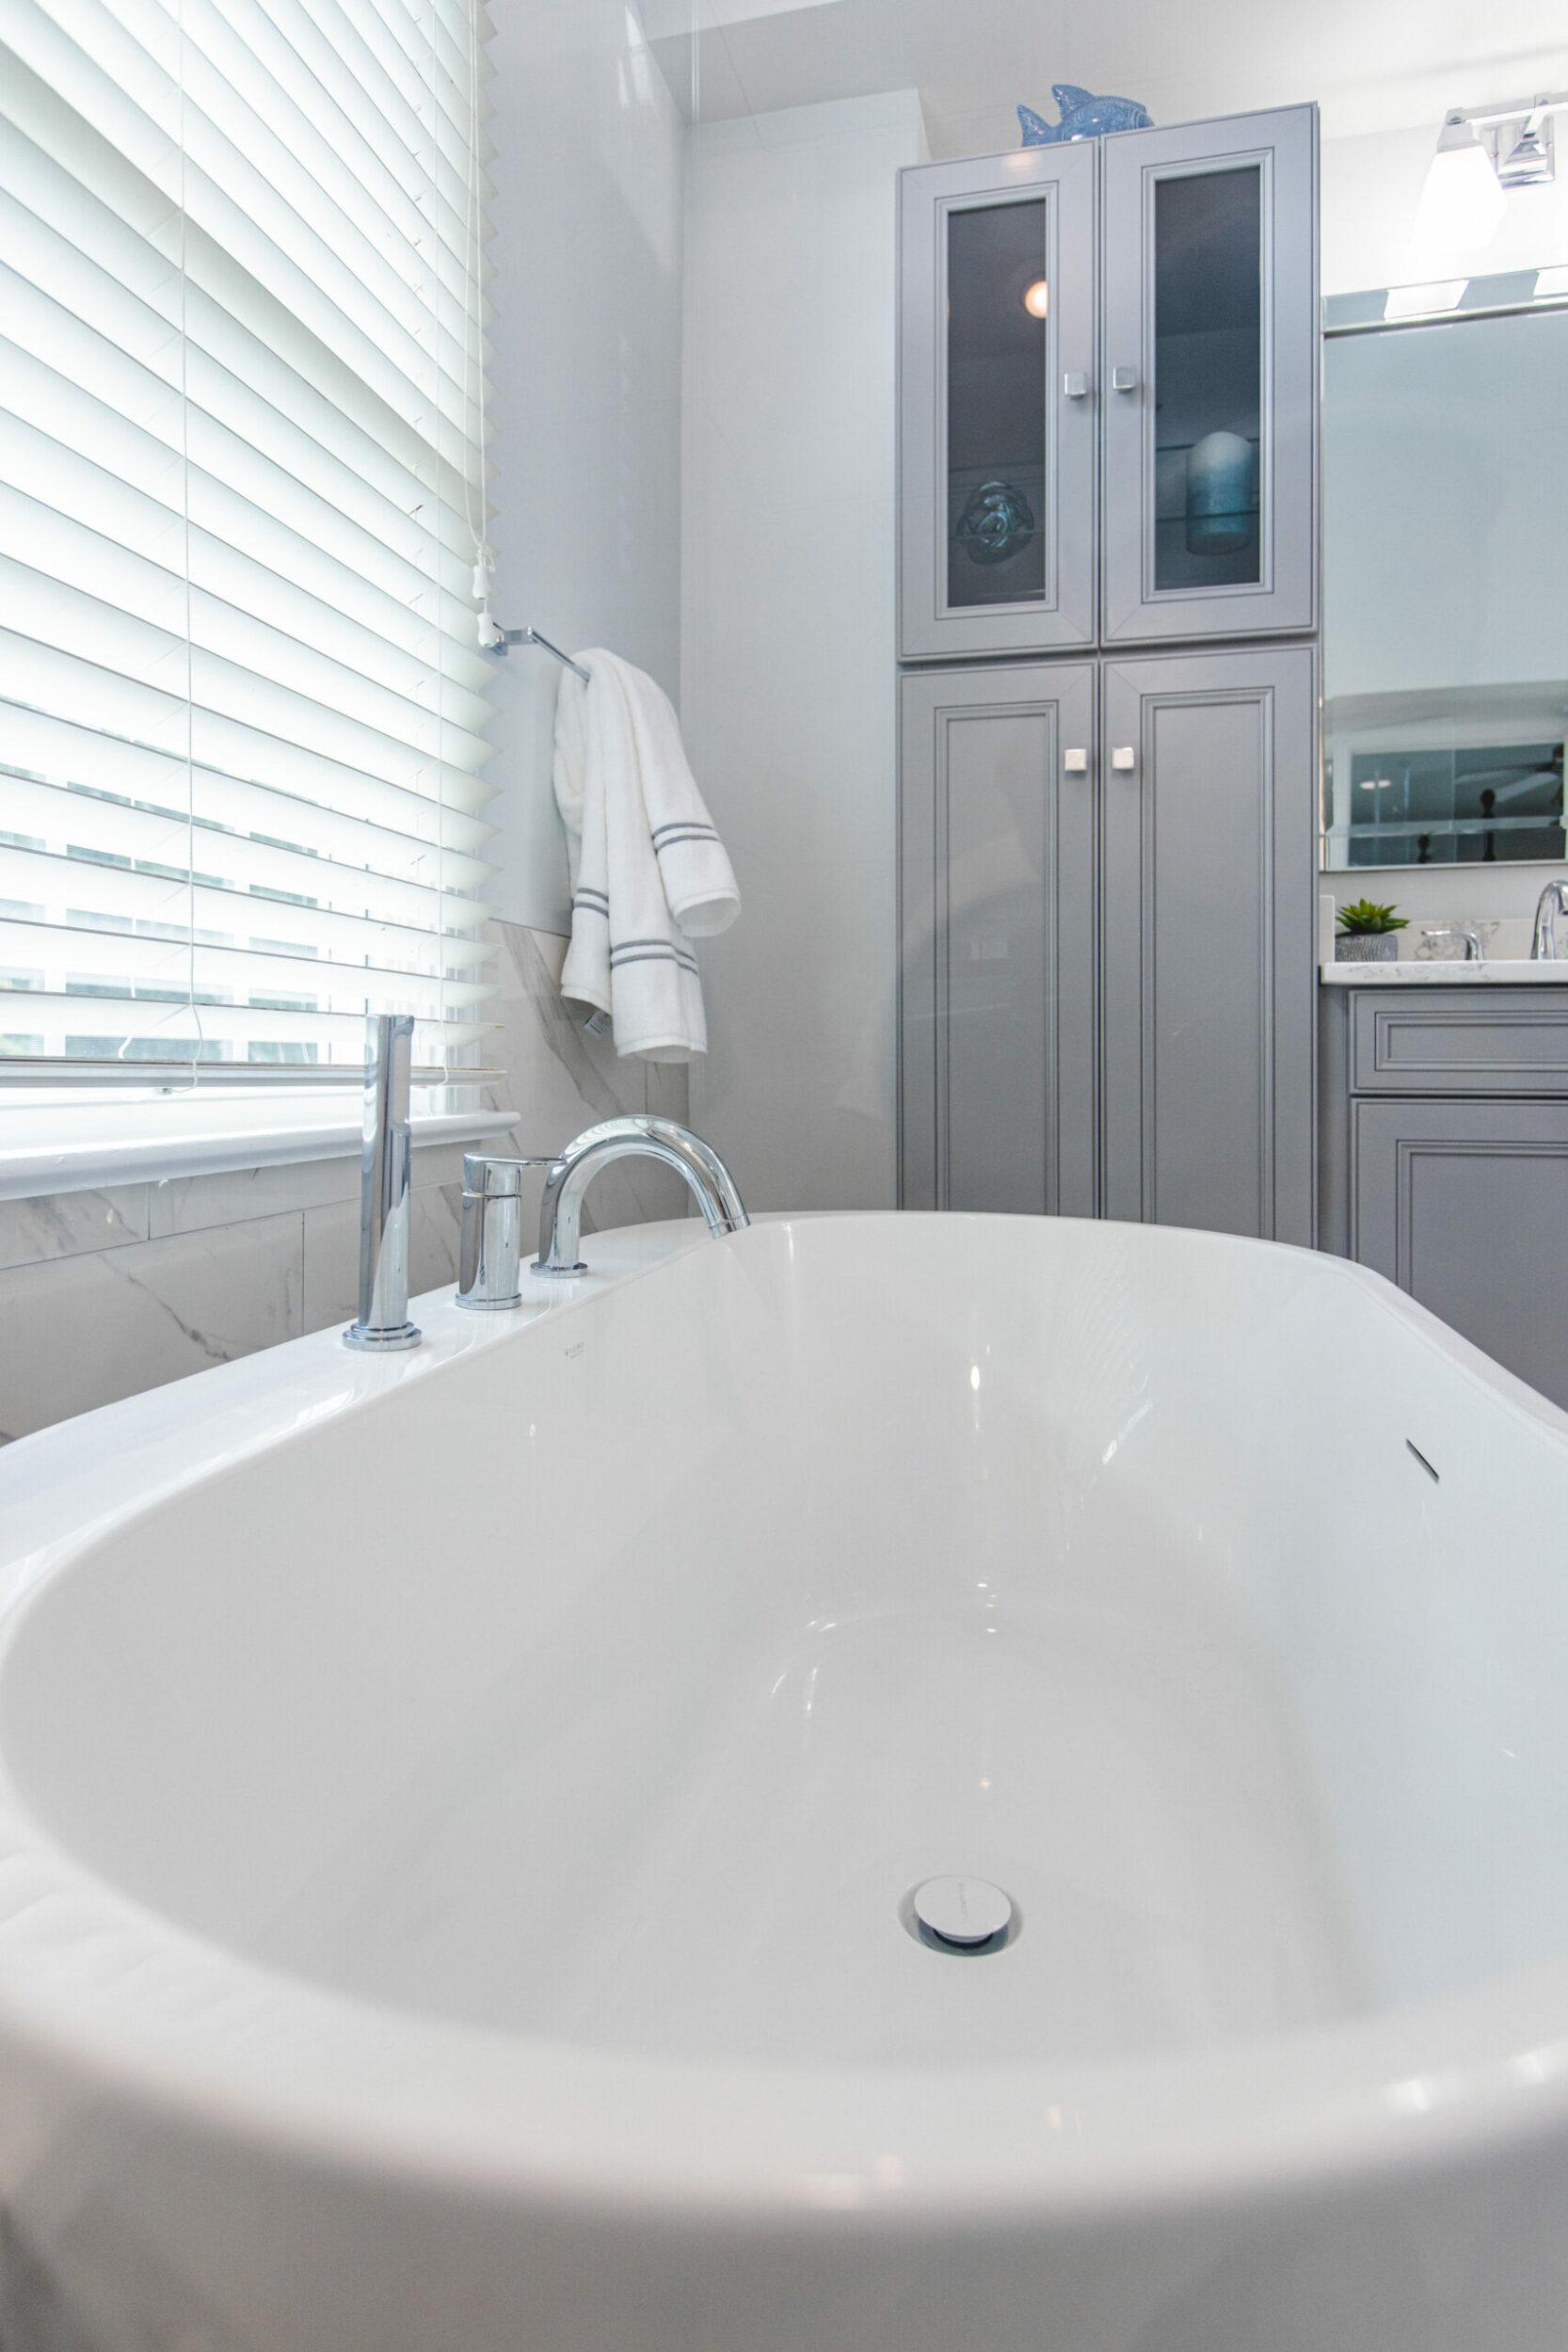 Bathtub remodeling near me